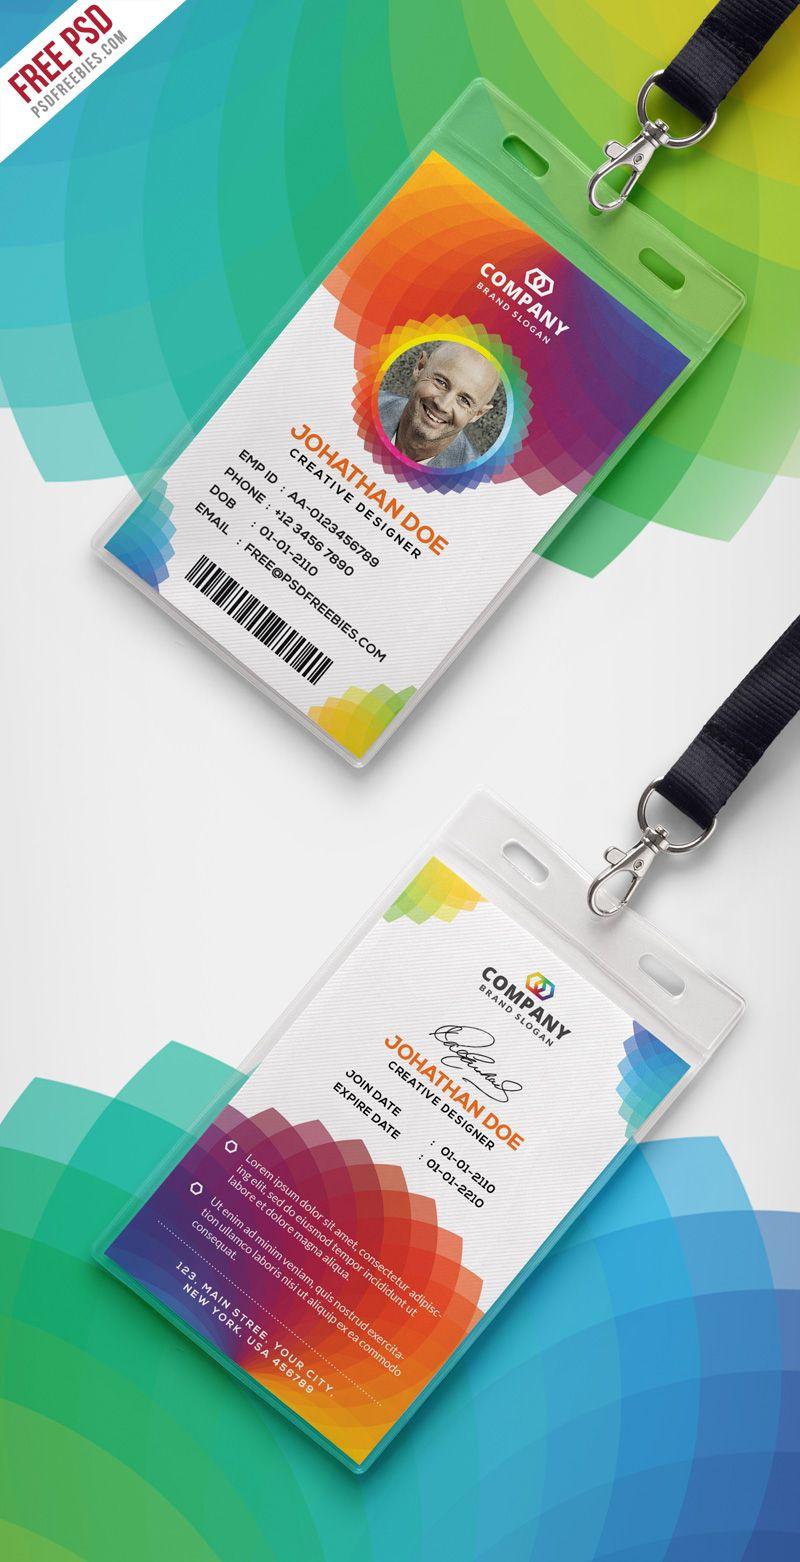 Corporate Branding Identity Card Free PSD | PSD Print ...